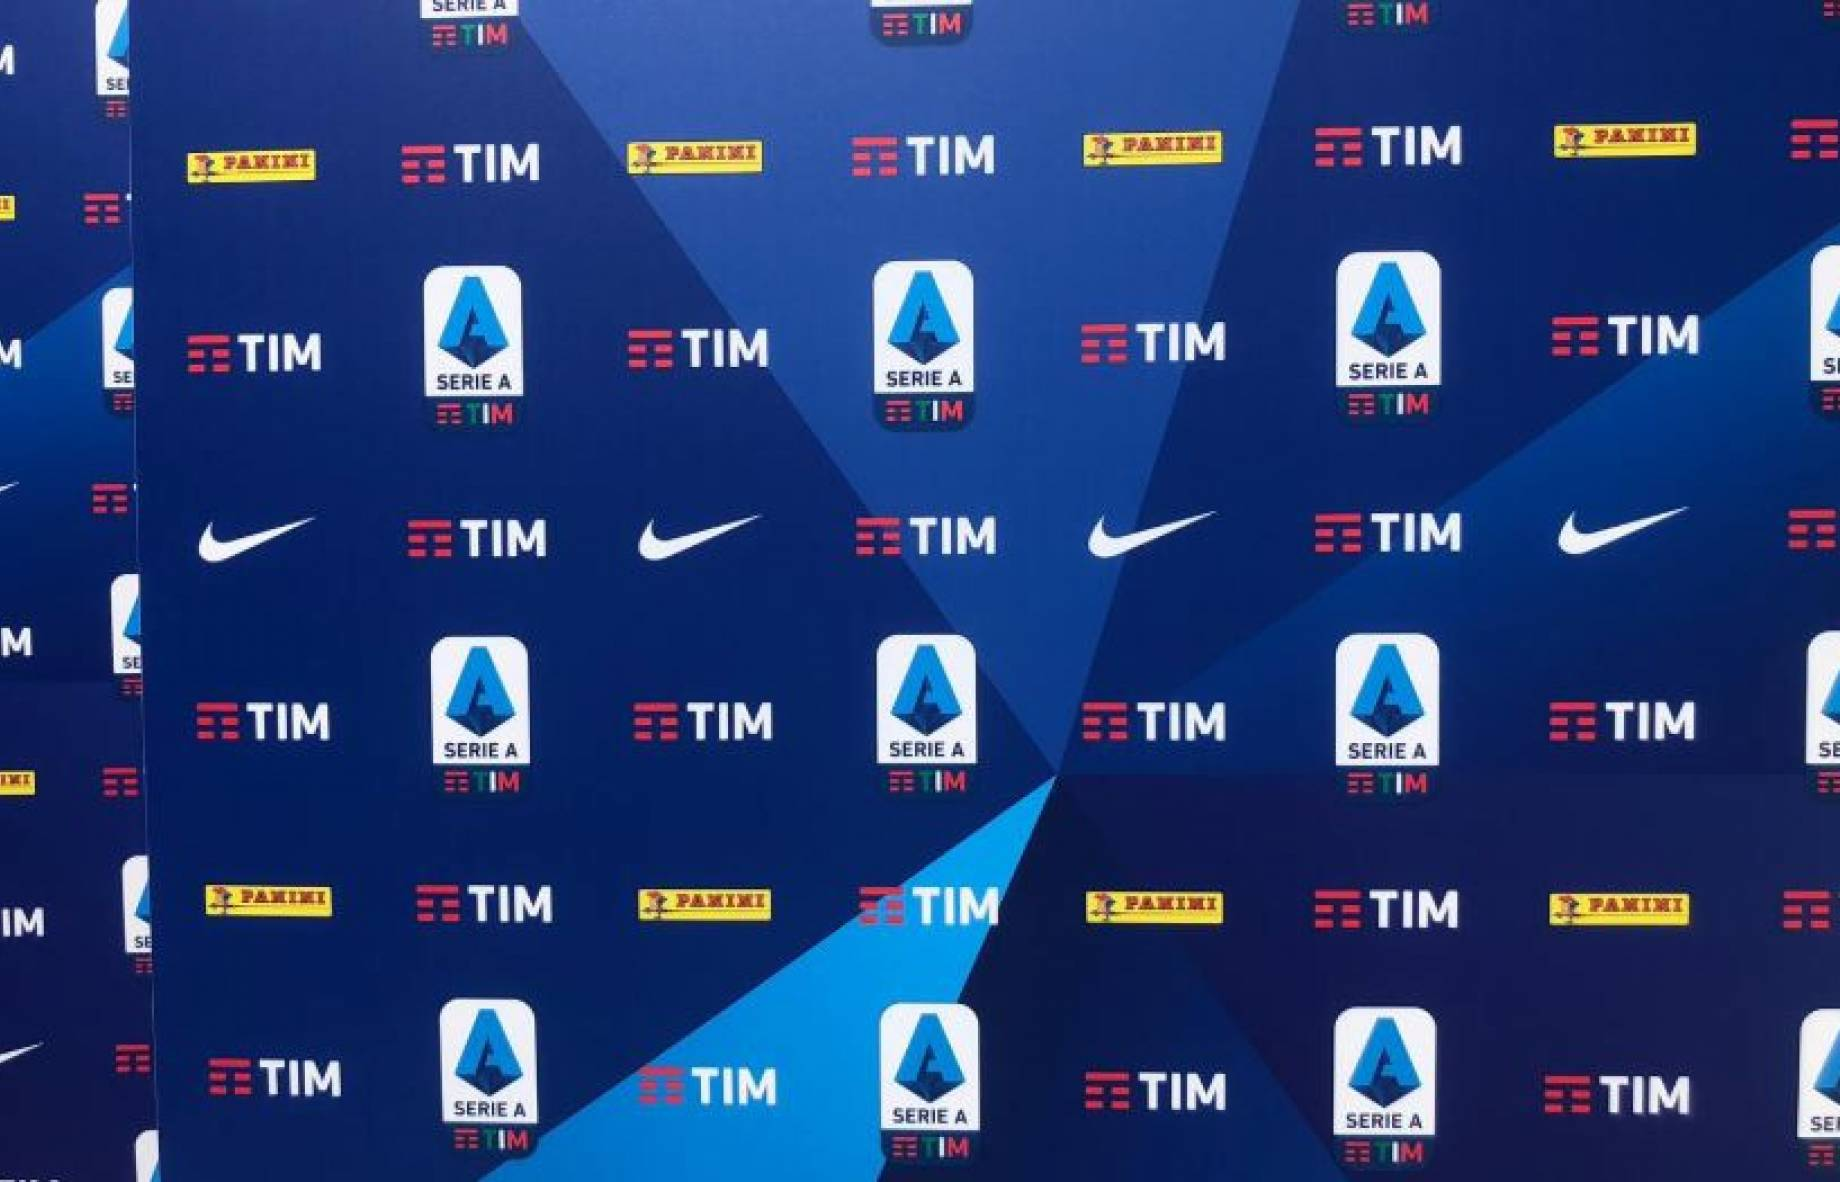 Calendario Serie B 2020 19.Gianluca Di Marzio Calendario Serie A 19 20 I Criteri Di